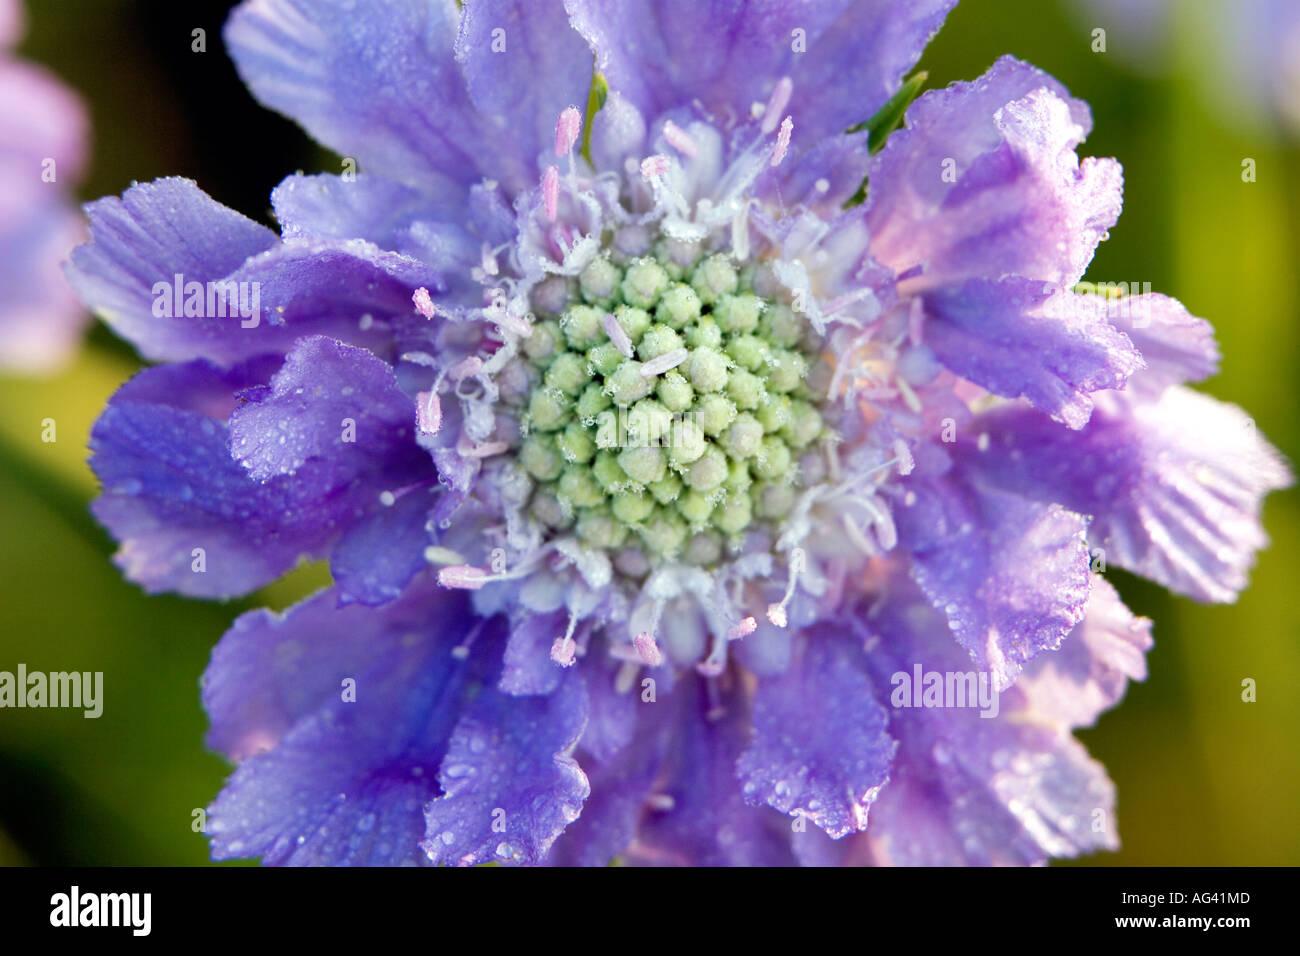 Scabiosa columbaria blue cockade flower head close-up in the sunlight - Stock Image